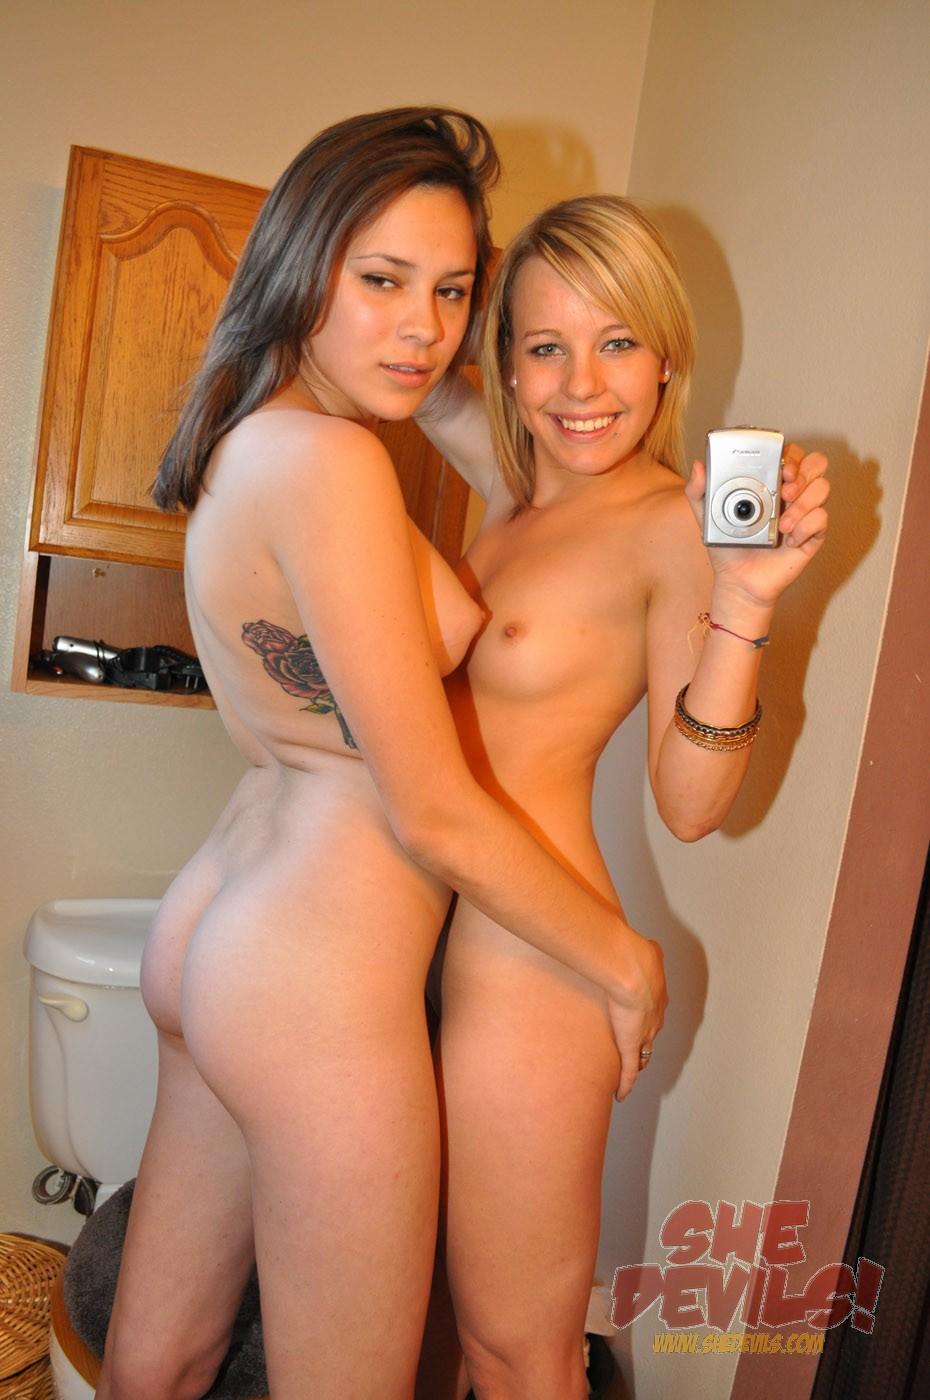 genuine naked photos of girls